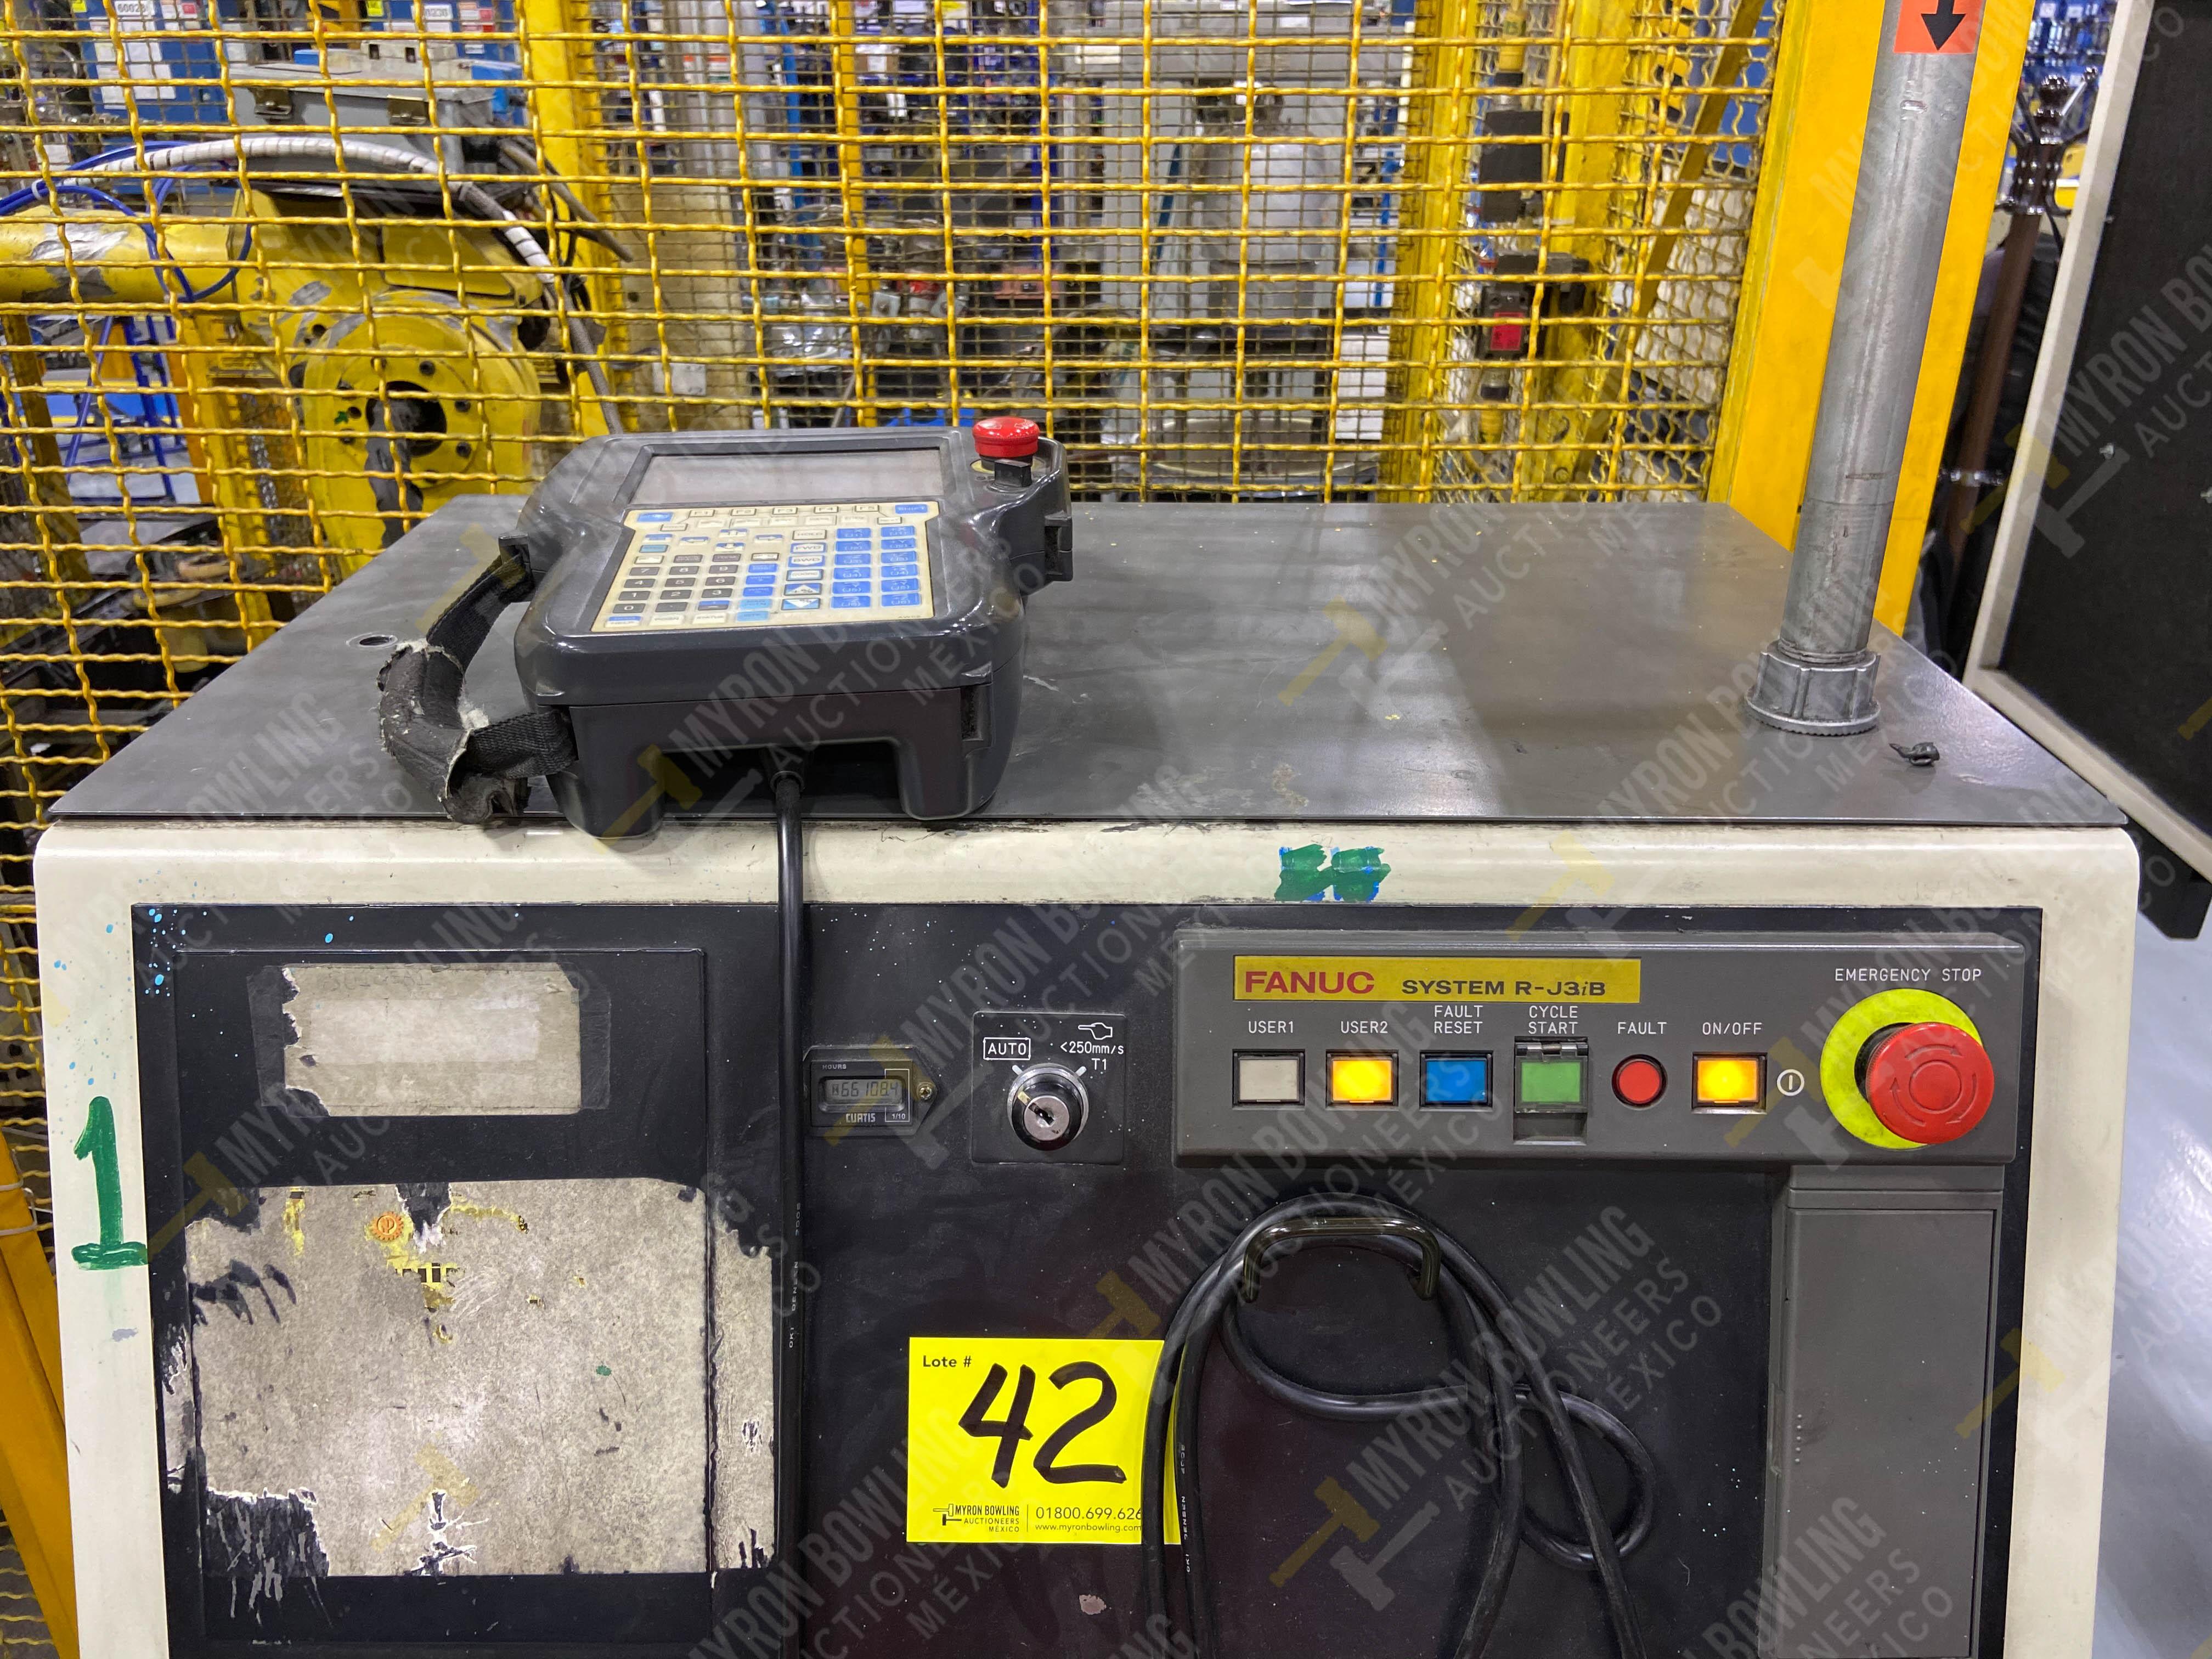 Robot marca Fanuc con capacidad de carga de 15-30 Kg, controlador de robot y teach pendant - Image 12 of 14